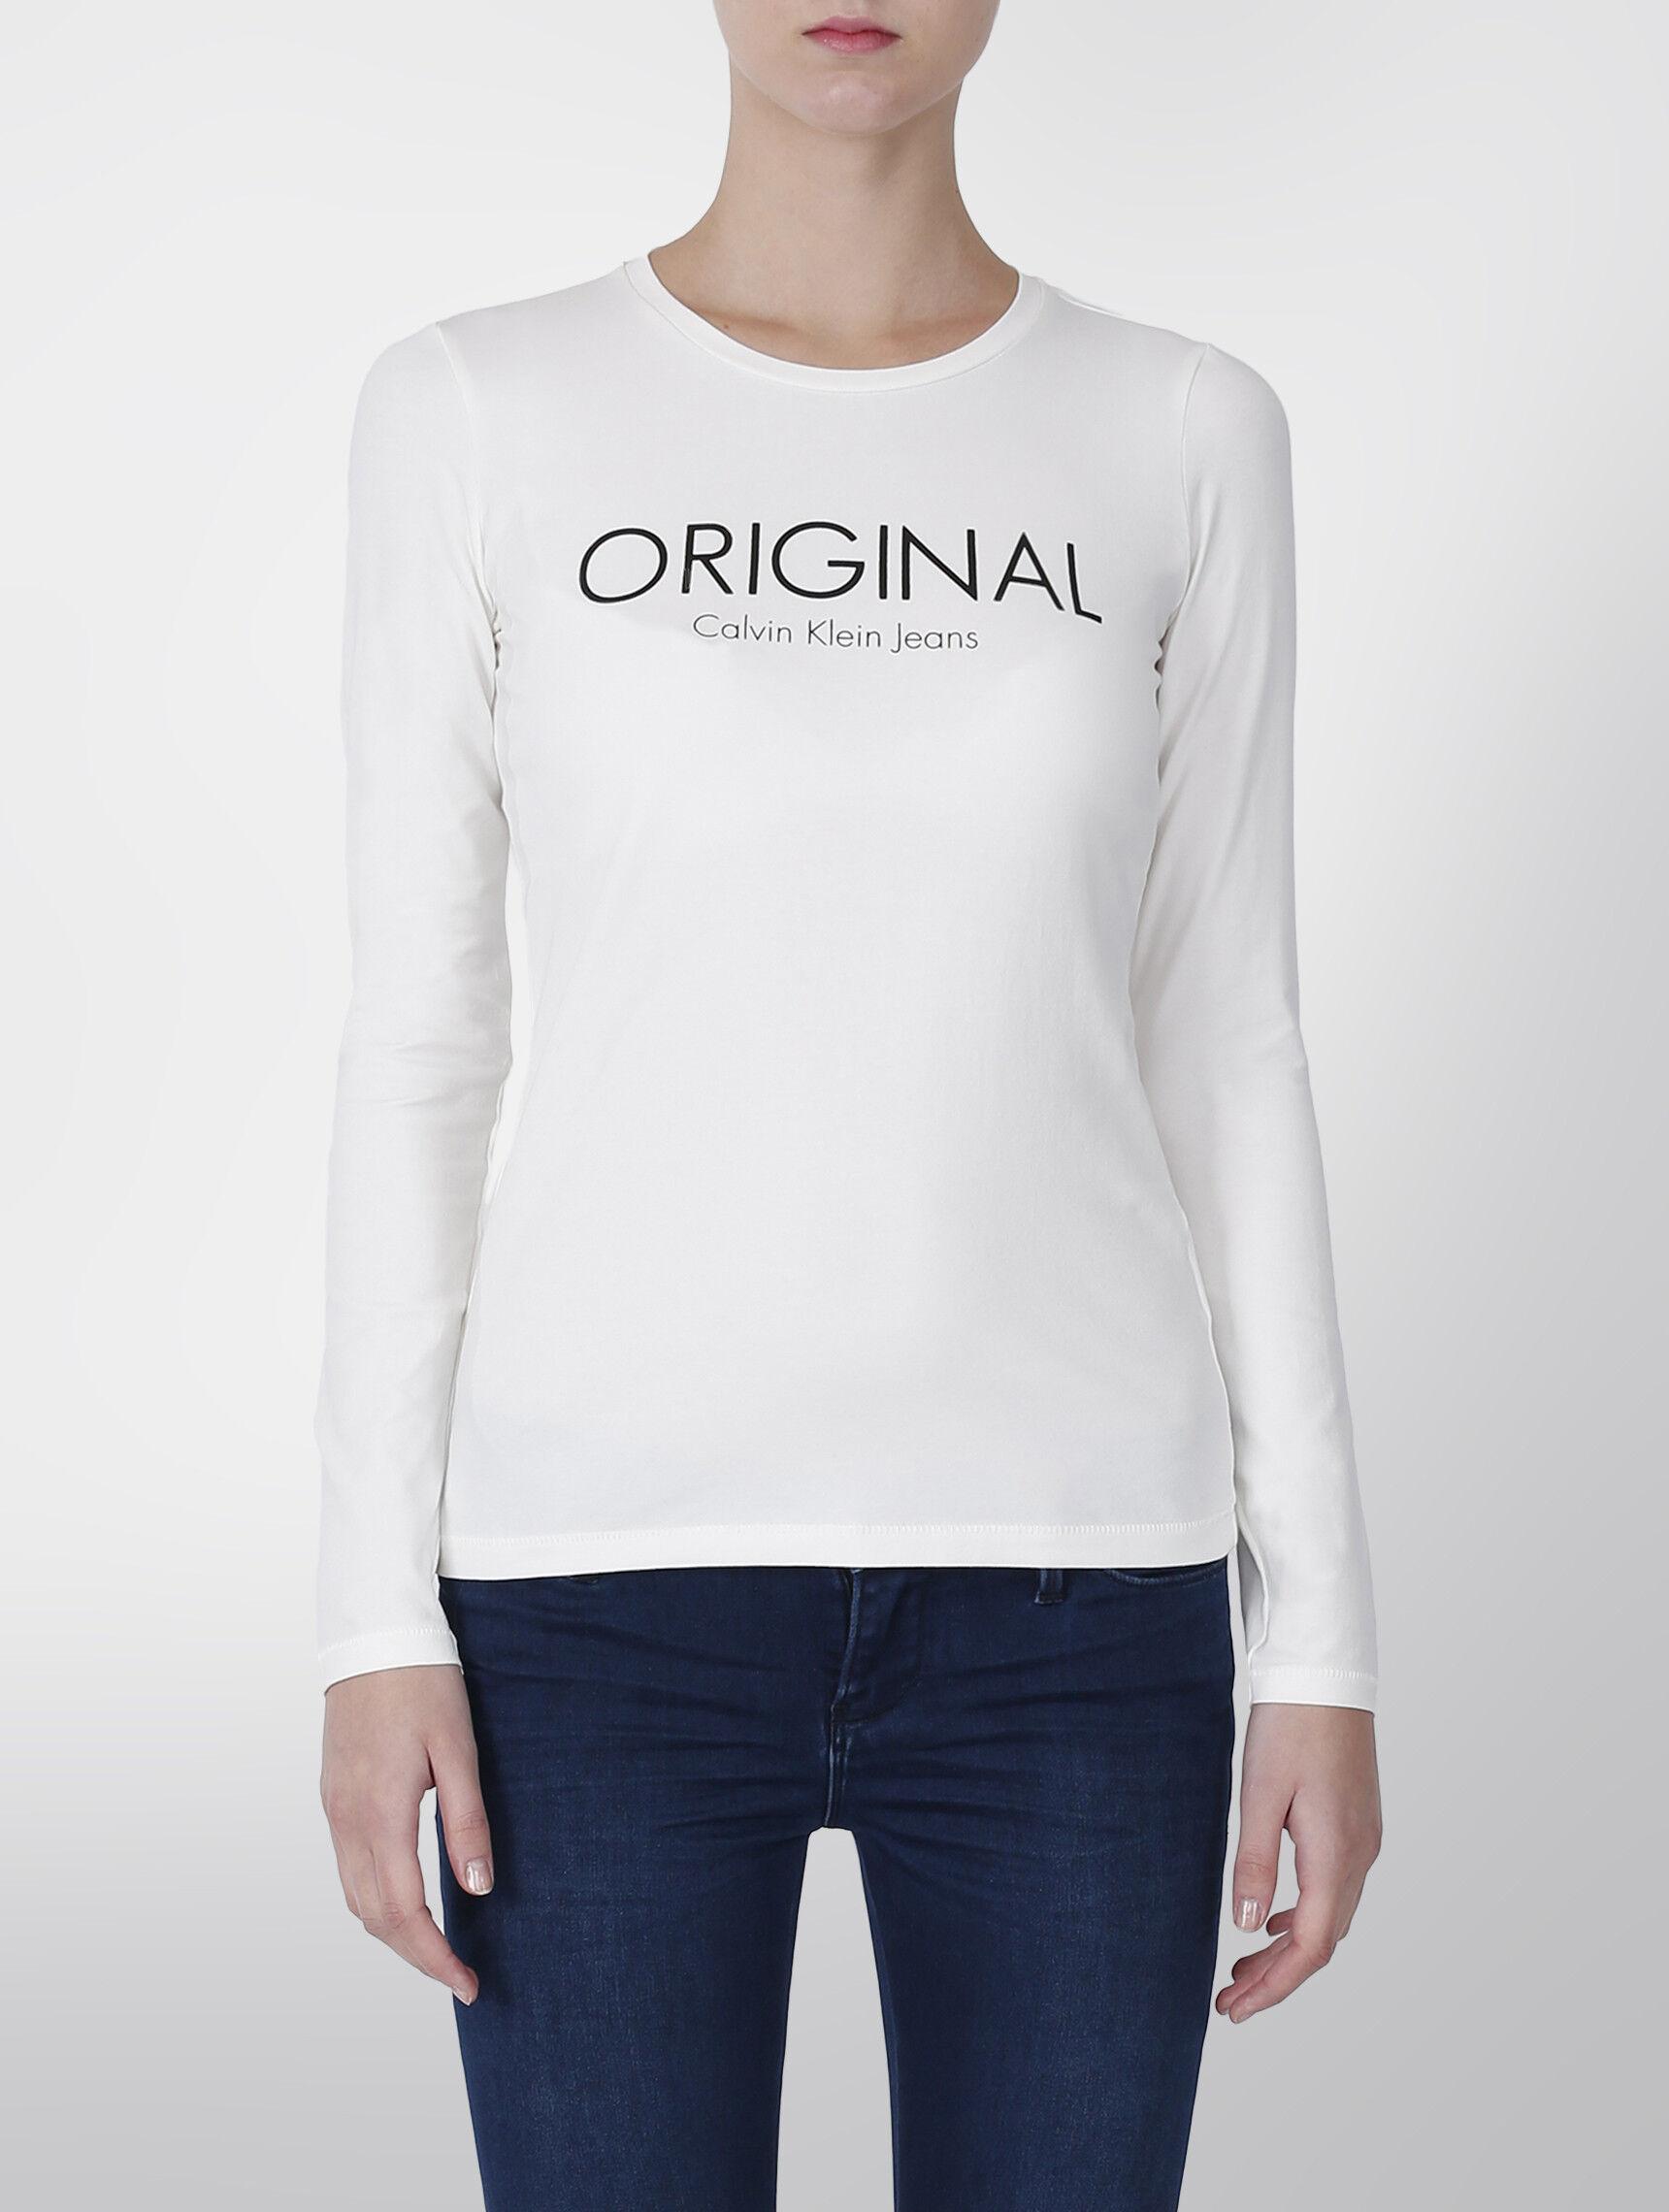 Buy Calvin Klein Shirts